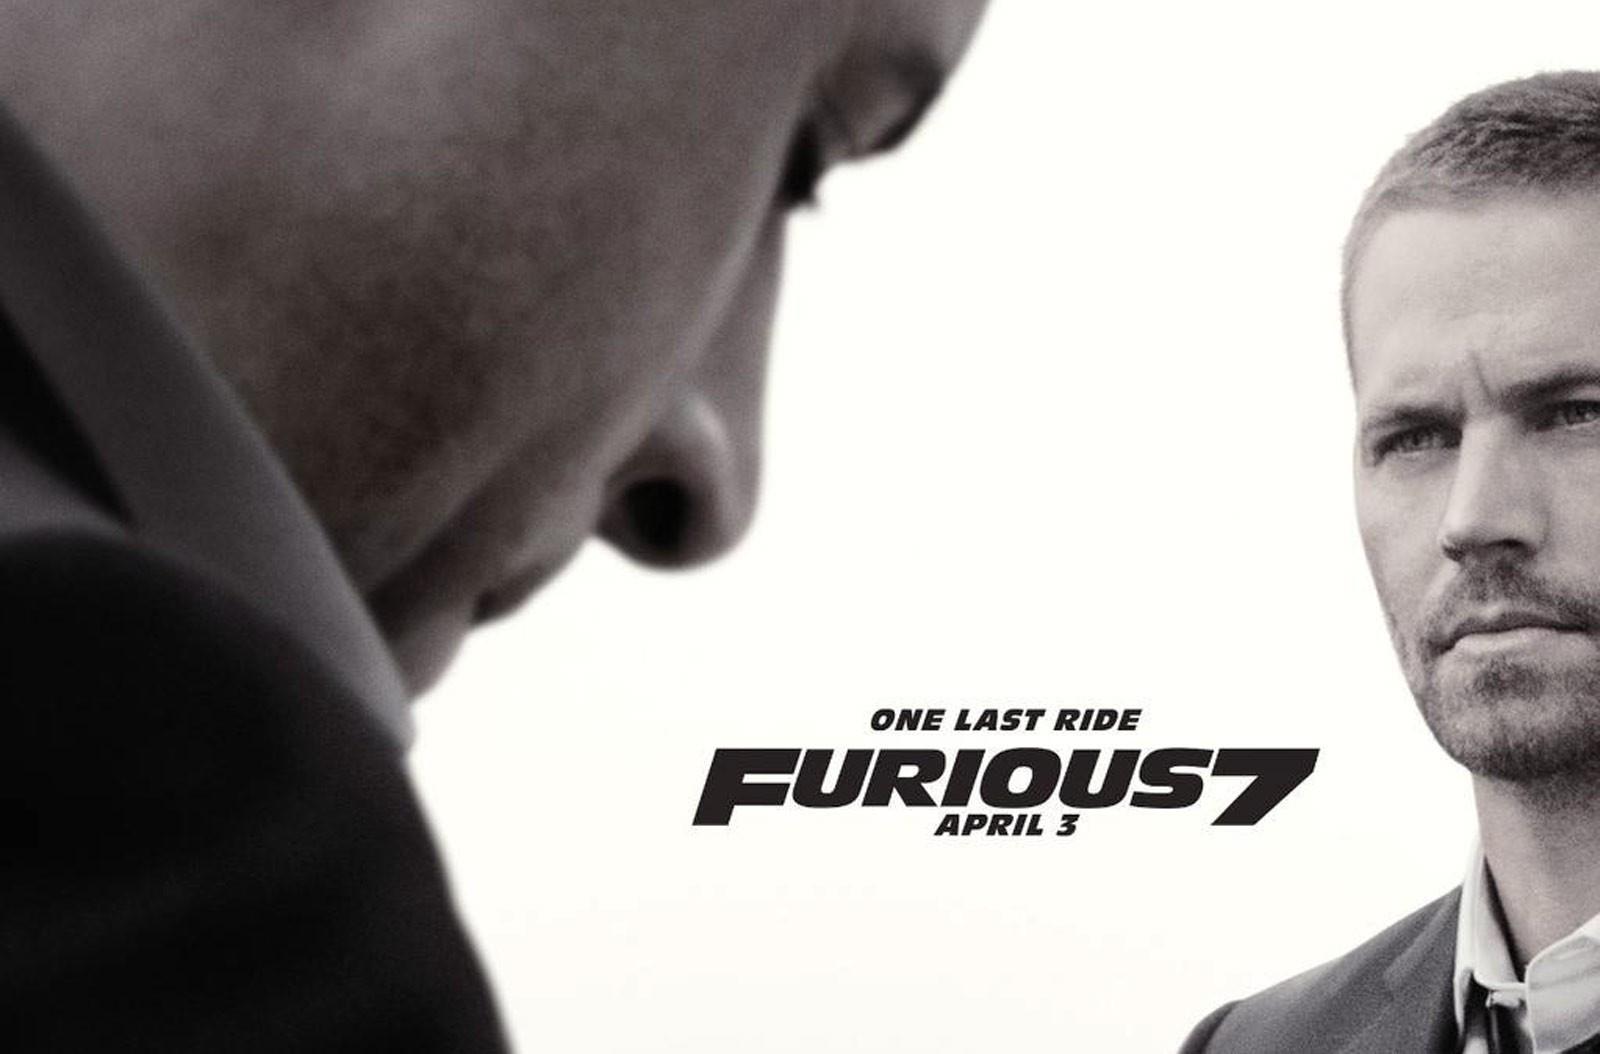 One Last Ride Furious 7 HD Wallpaper   Stylish HD Wallpapers 1600x1054